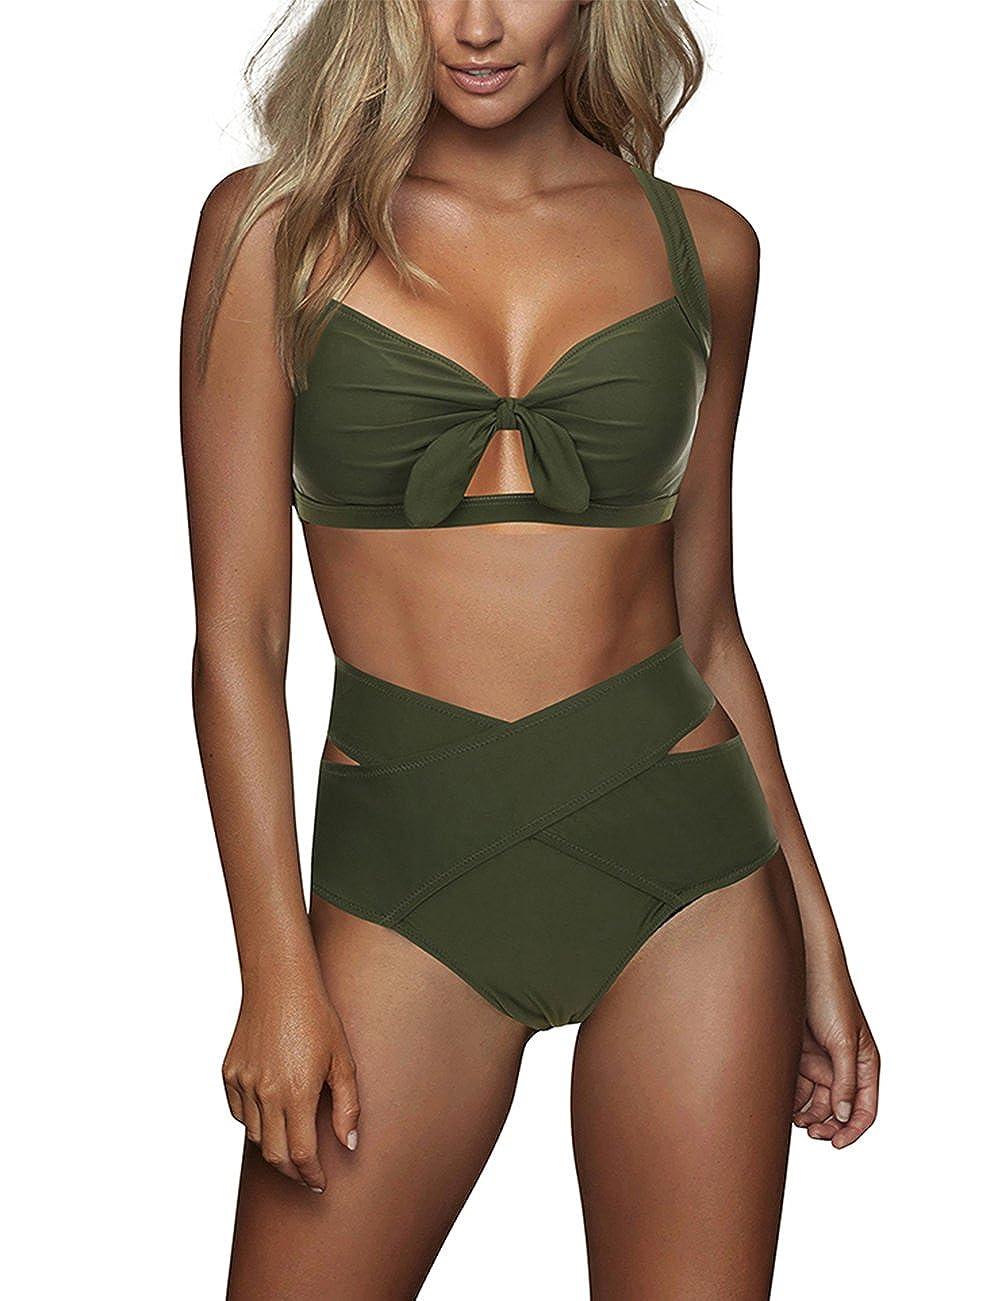 Feelin Girl Women's Sexy Criss Cross High Waist Bandage 2 Pcs Bikini Set Swimsuit by Feelin Girl